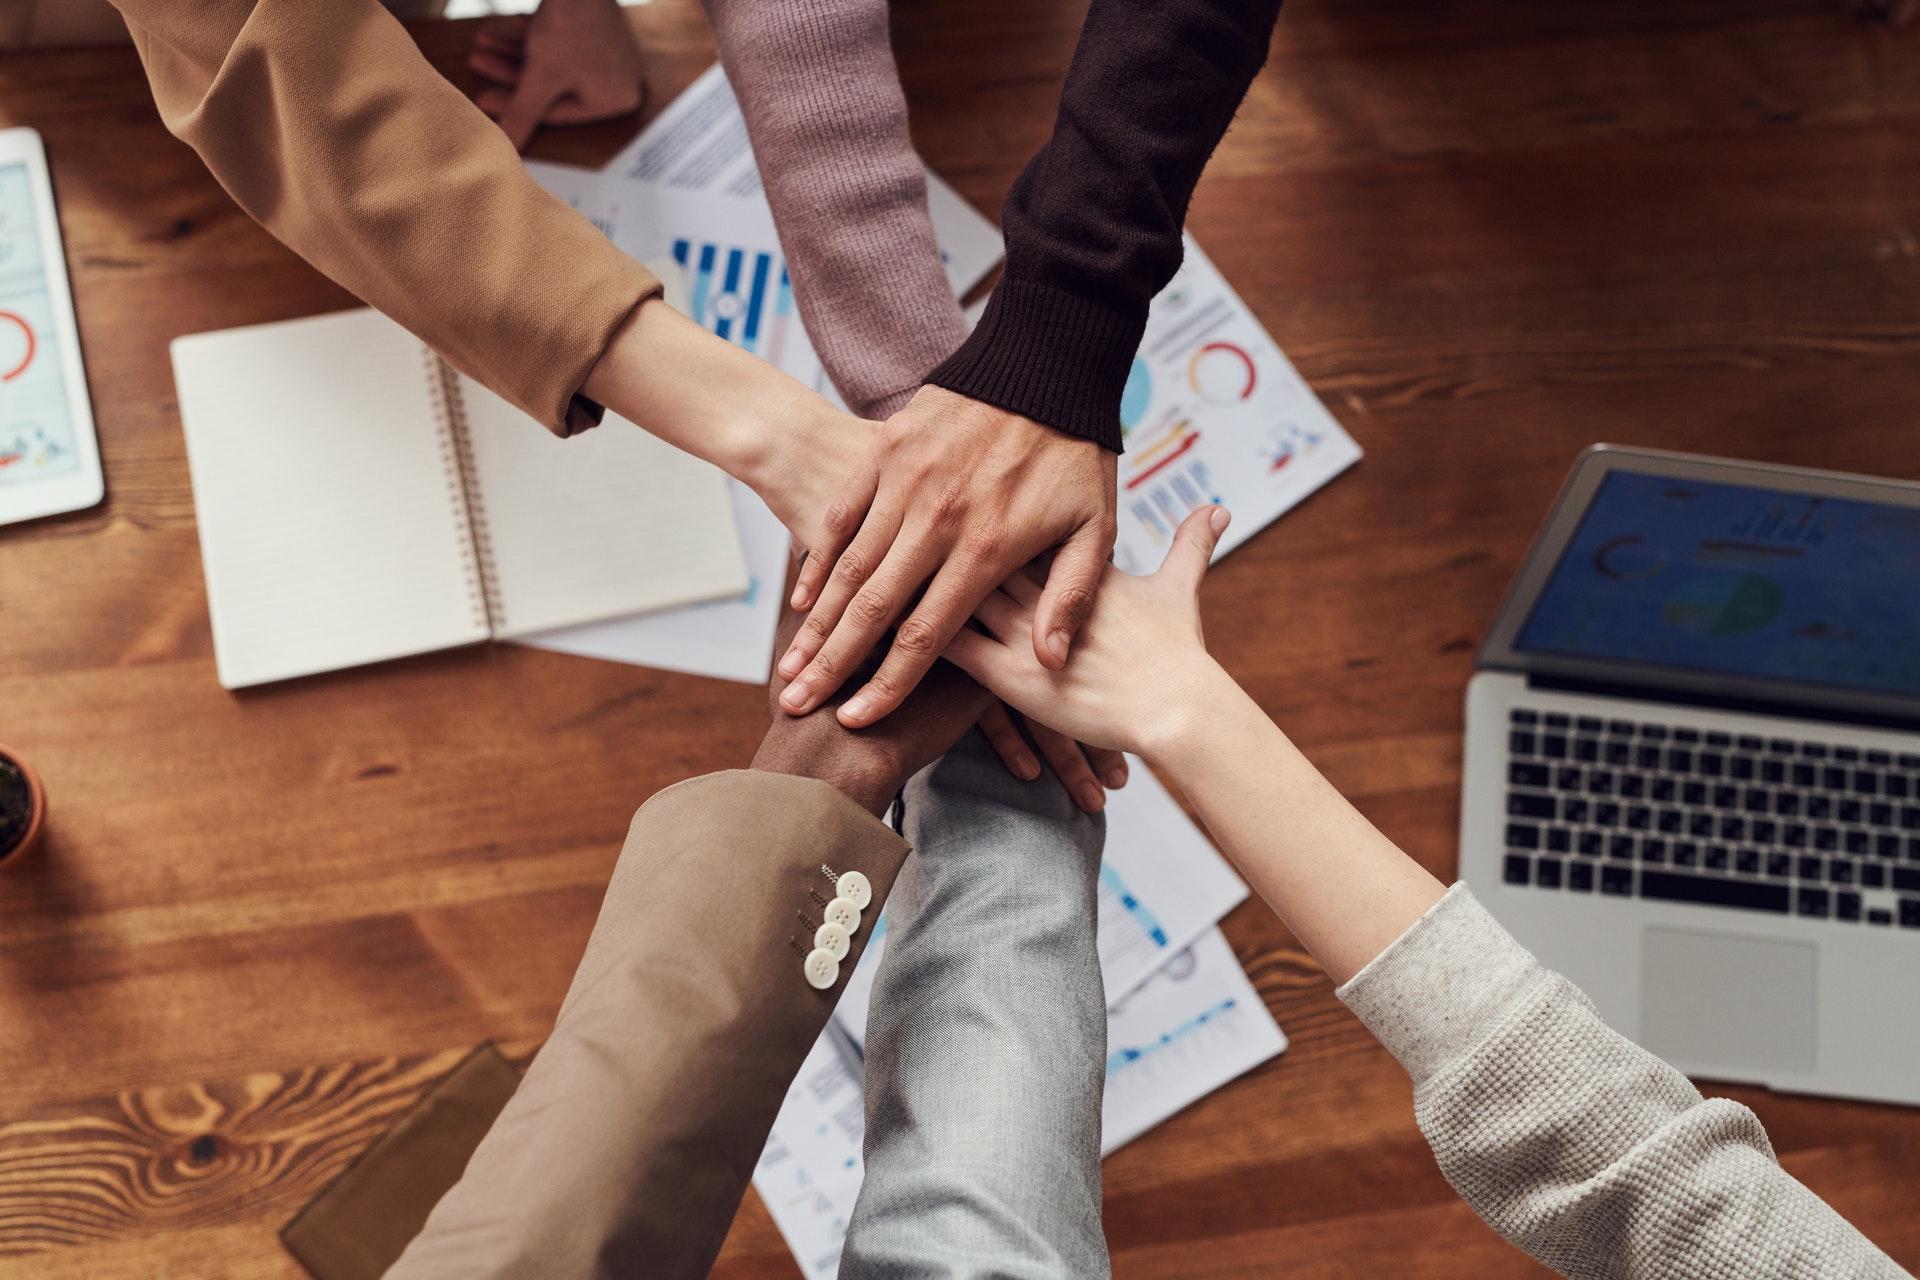 Ideen für Teambuilding-Maßnahmen